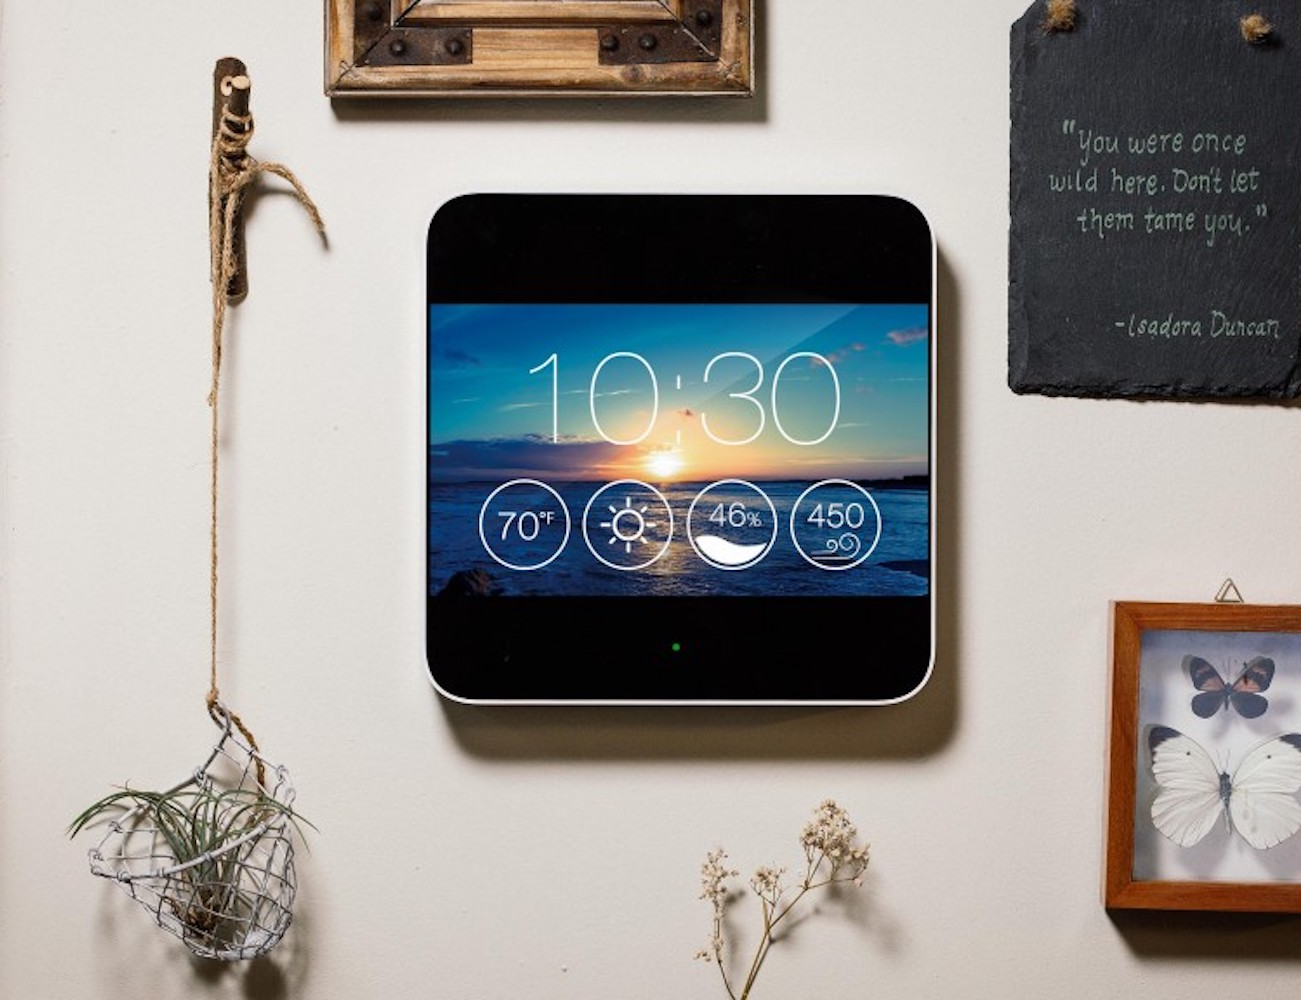 Sentri Home Monitoring Review